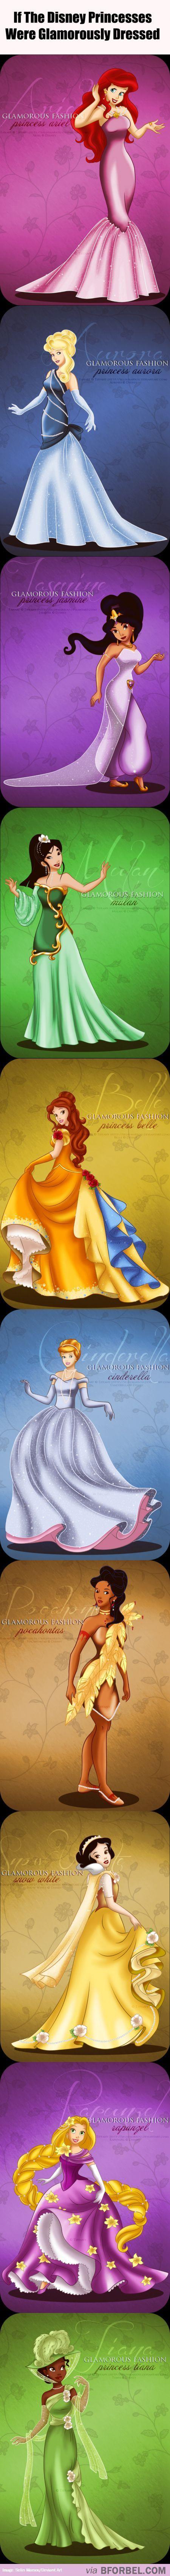 If the Disney Princesses were glamorously dressed